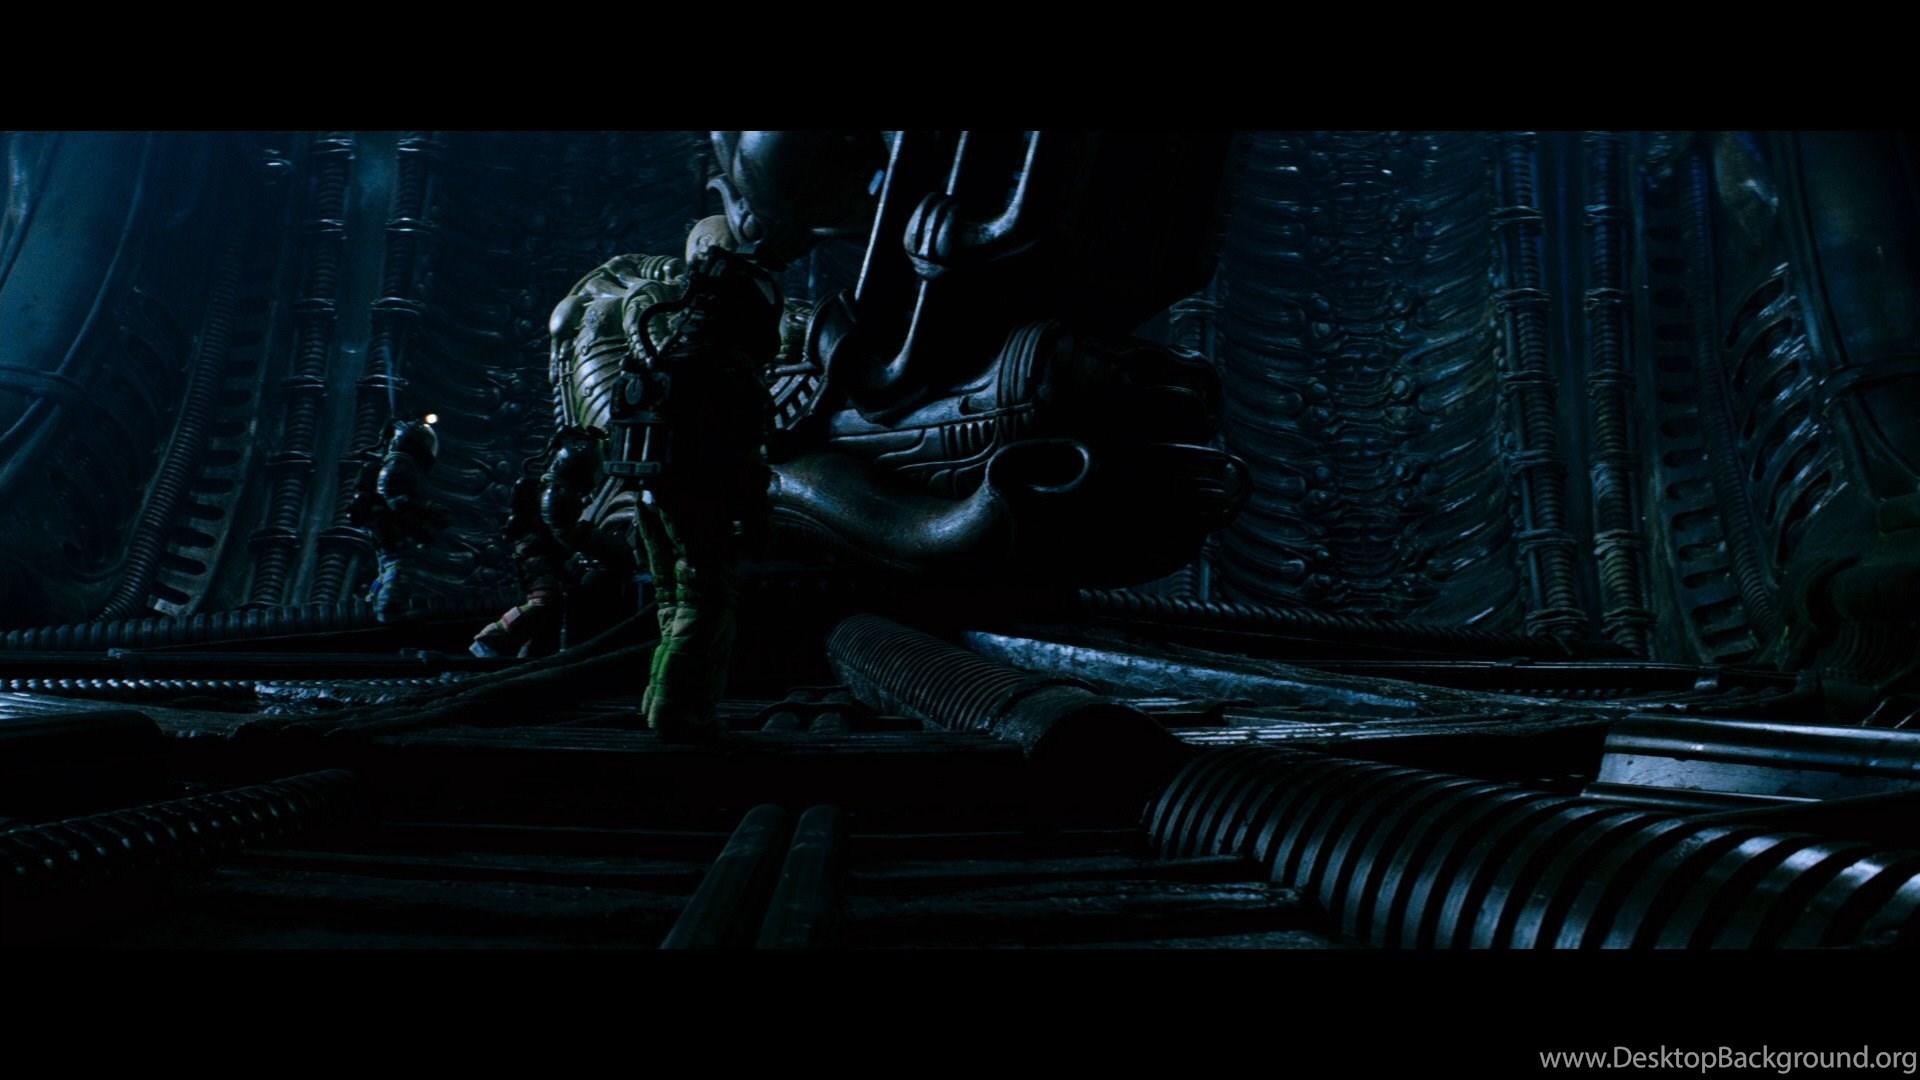 Outer Space Movies Spaceships Vehicles Aliens Movie Alien Desktop Background